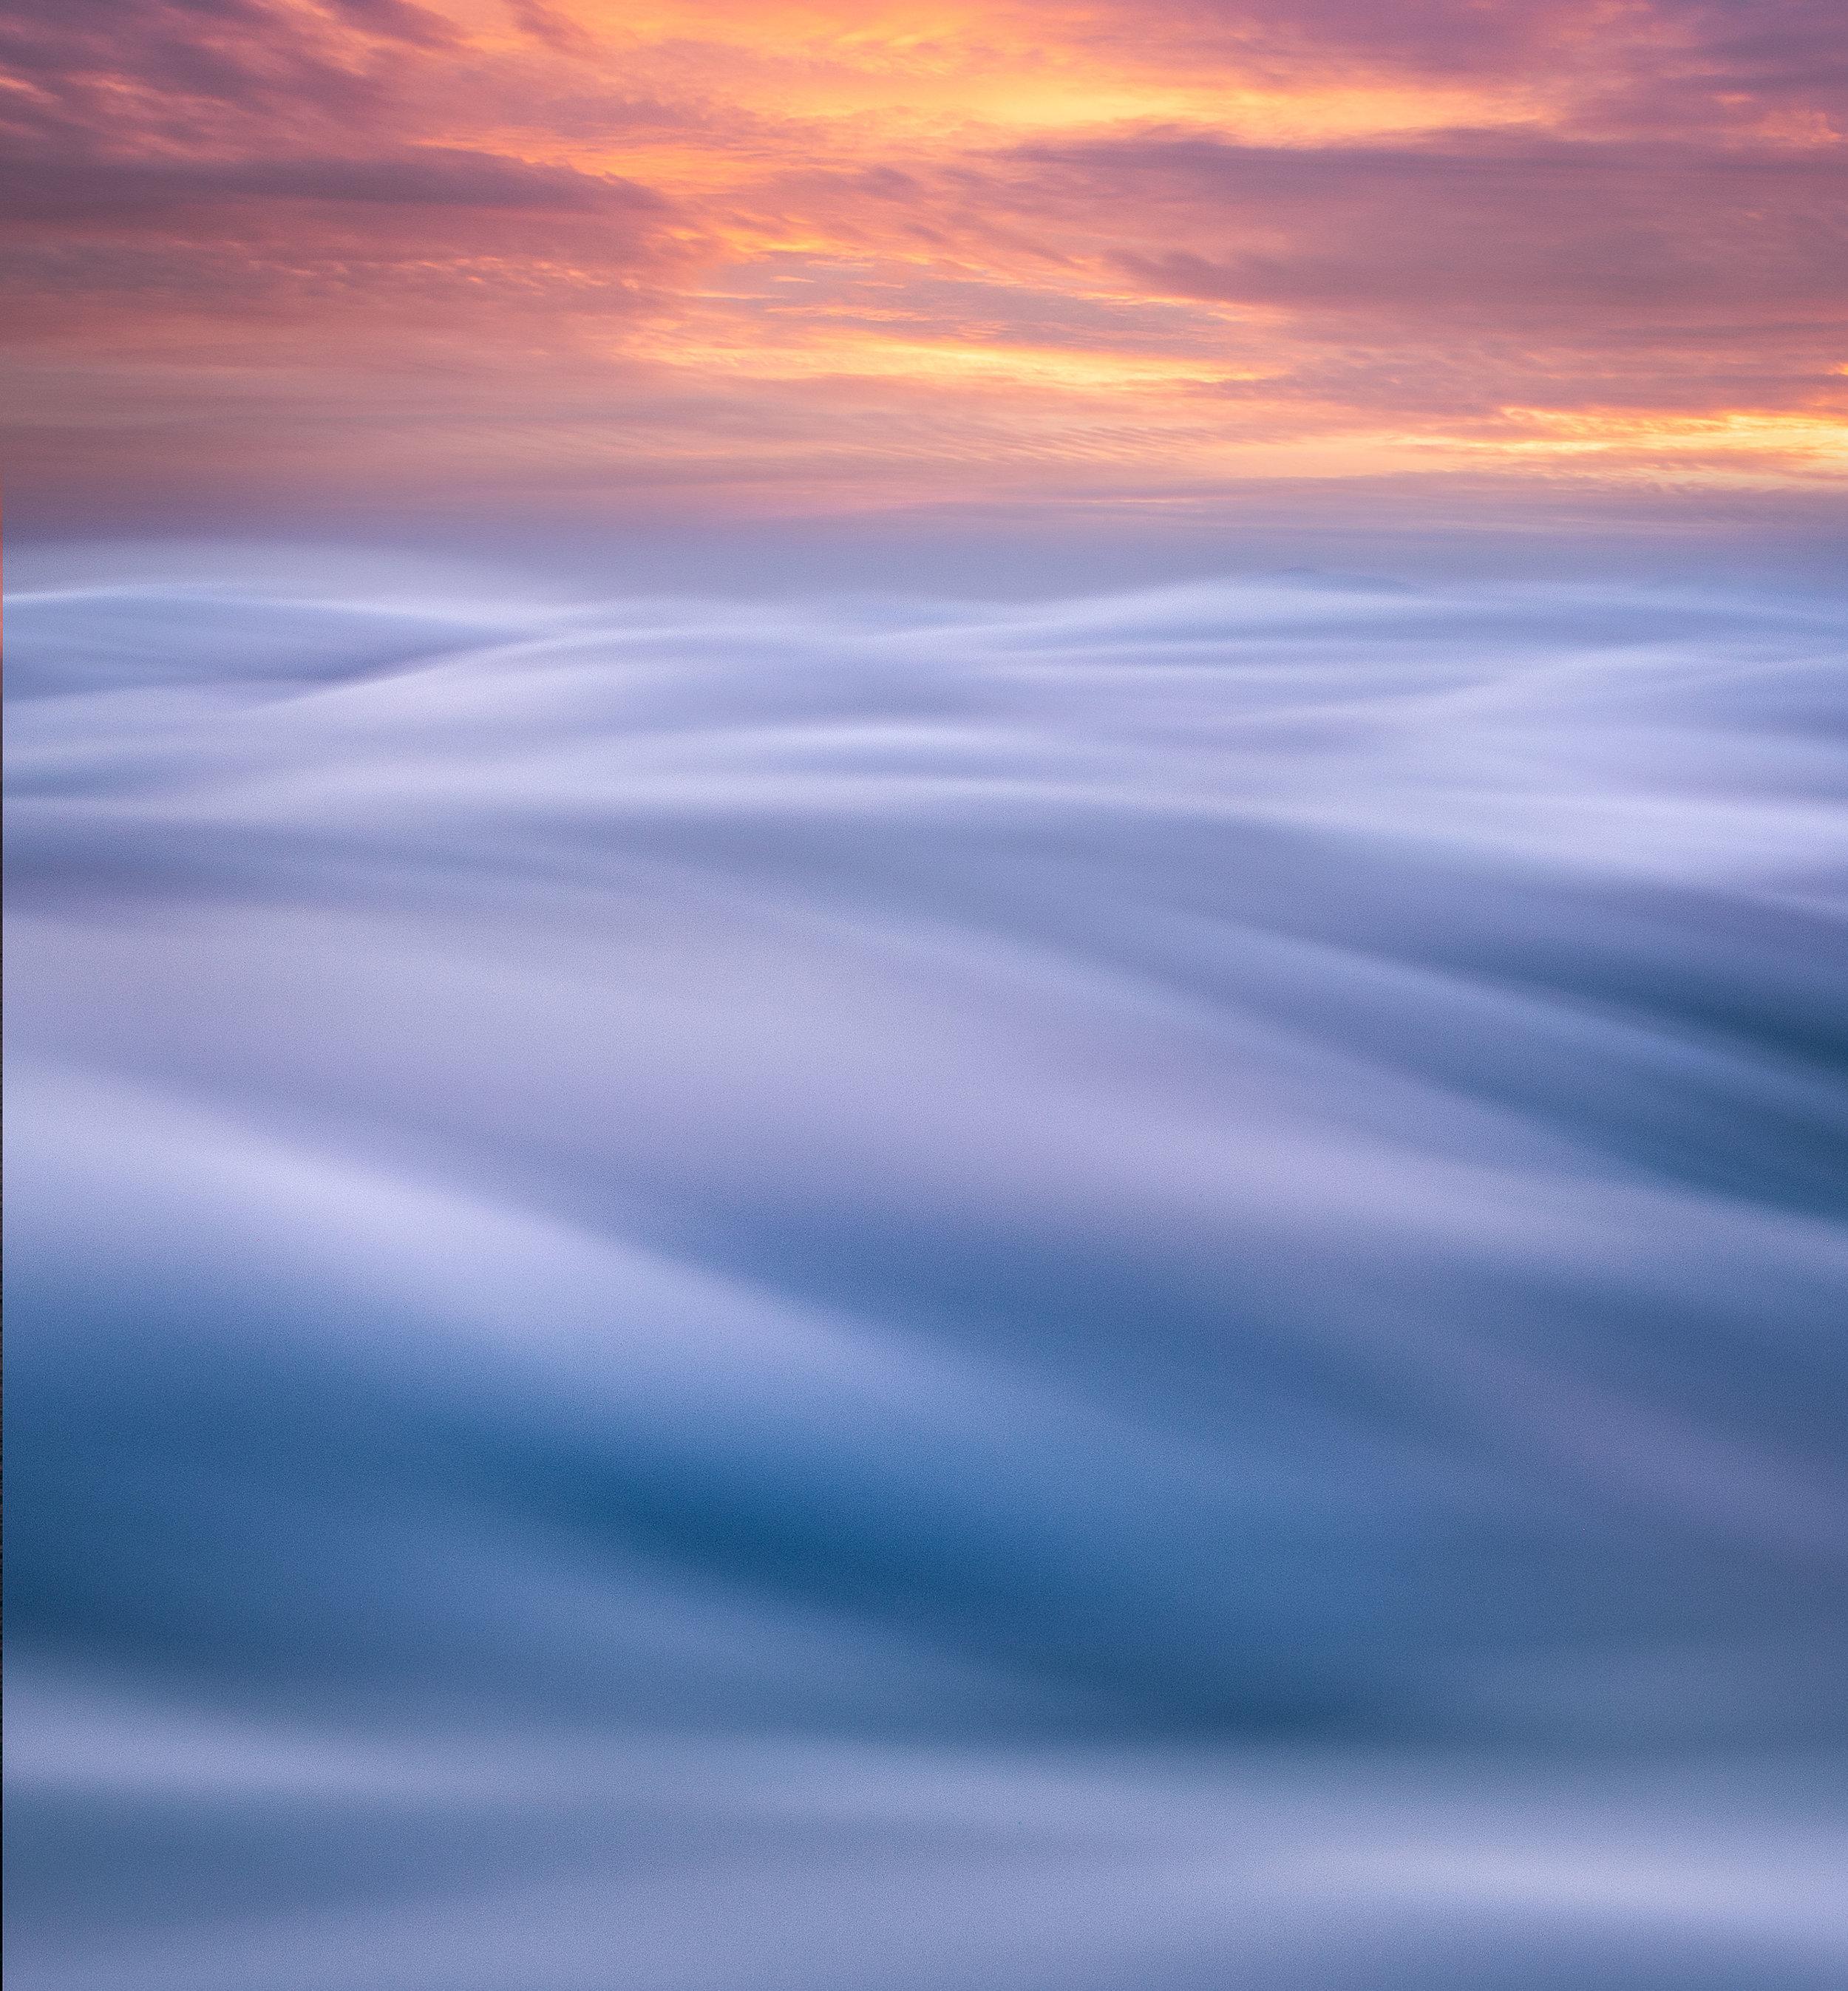 A sense of peacefulness